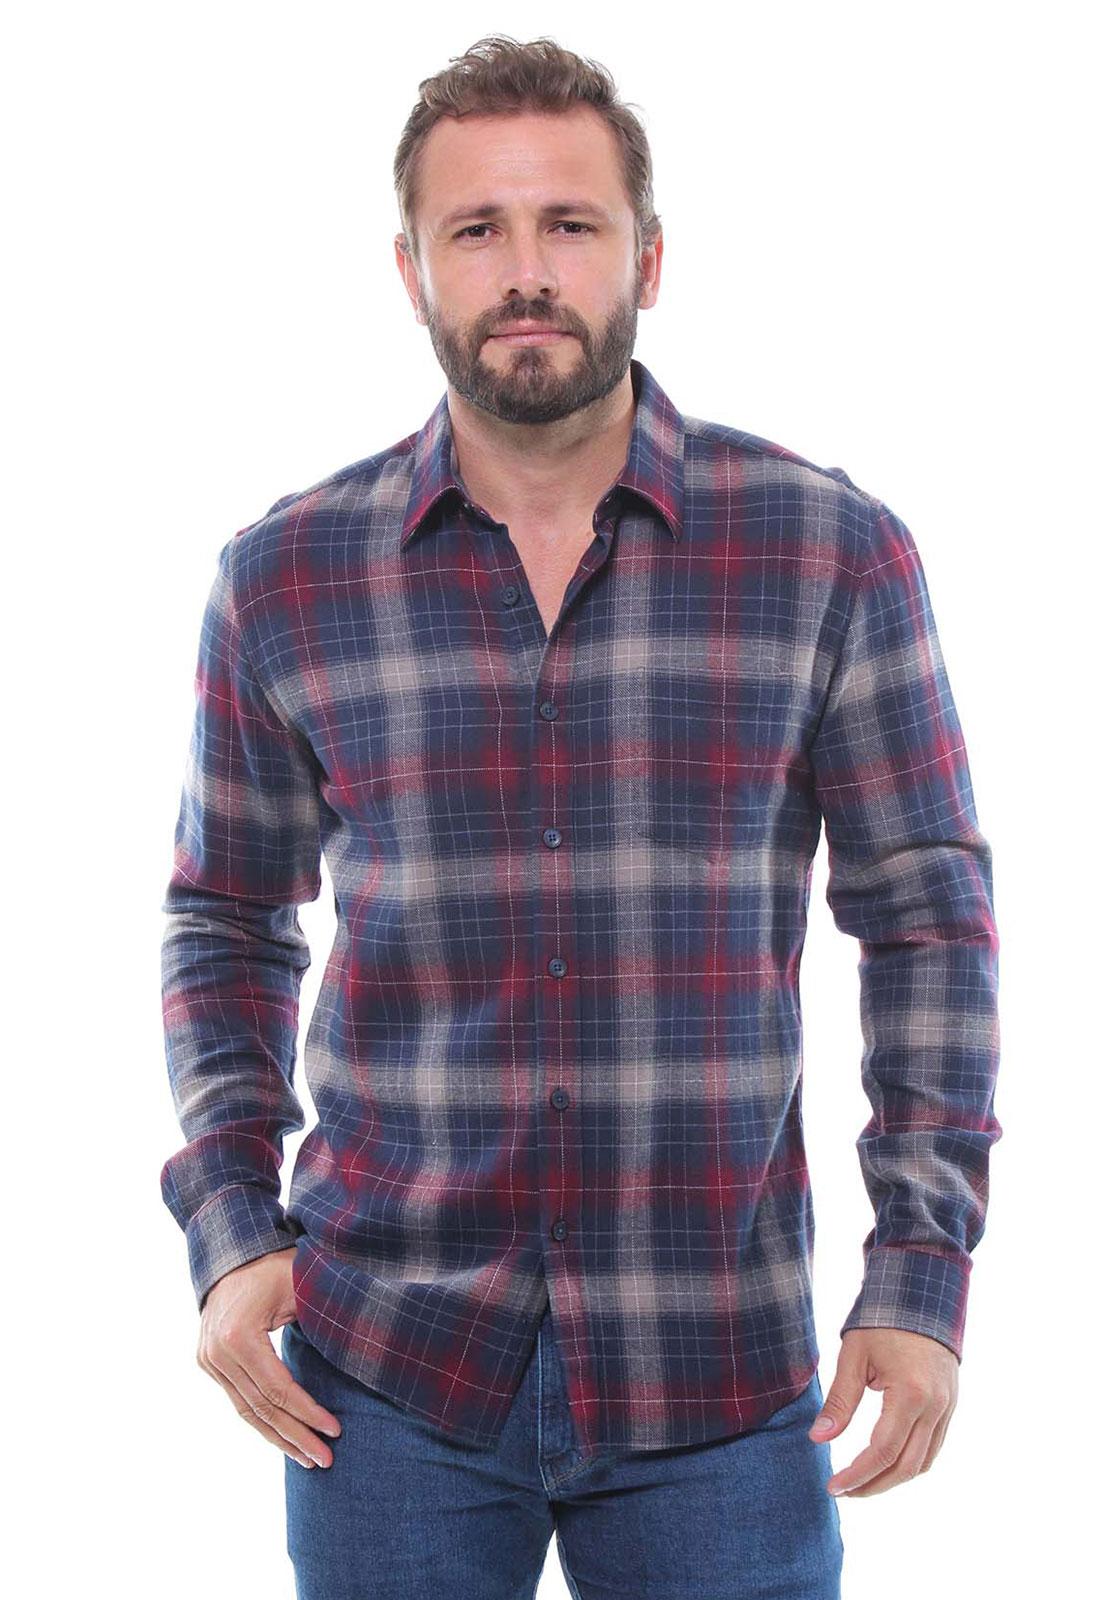 Camisa Xadrez Masculina Flanelada Manga Longa Crocker - 47346  - CROCKER JEANS